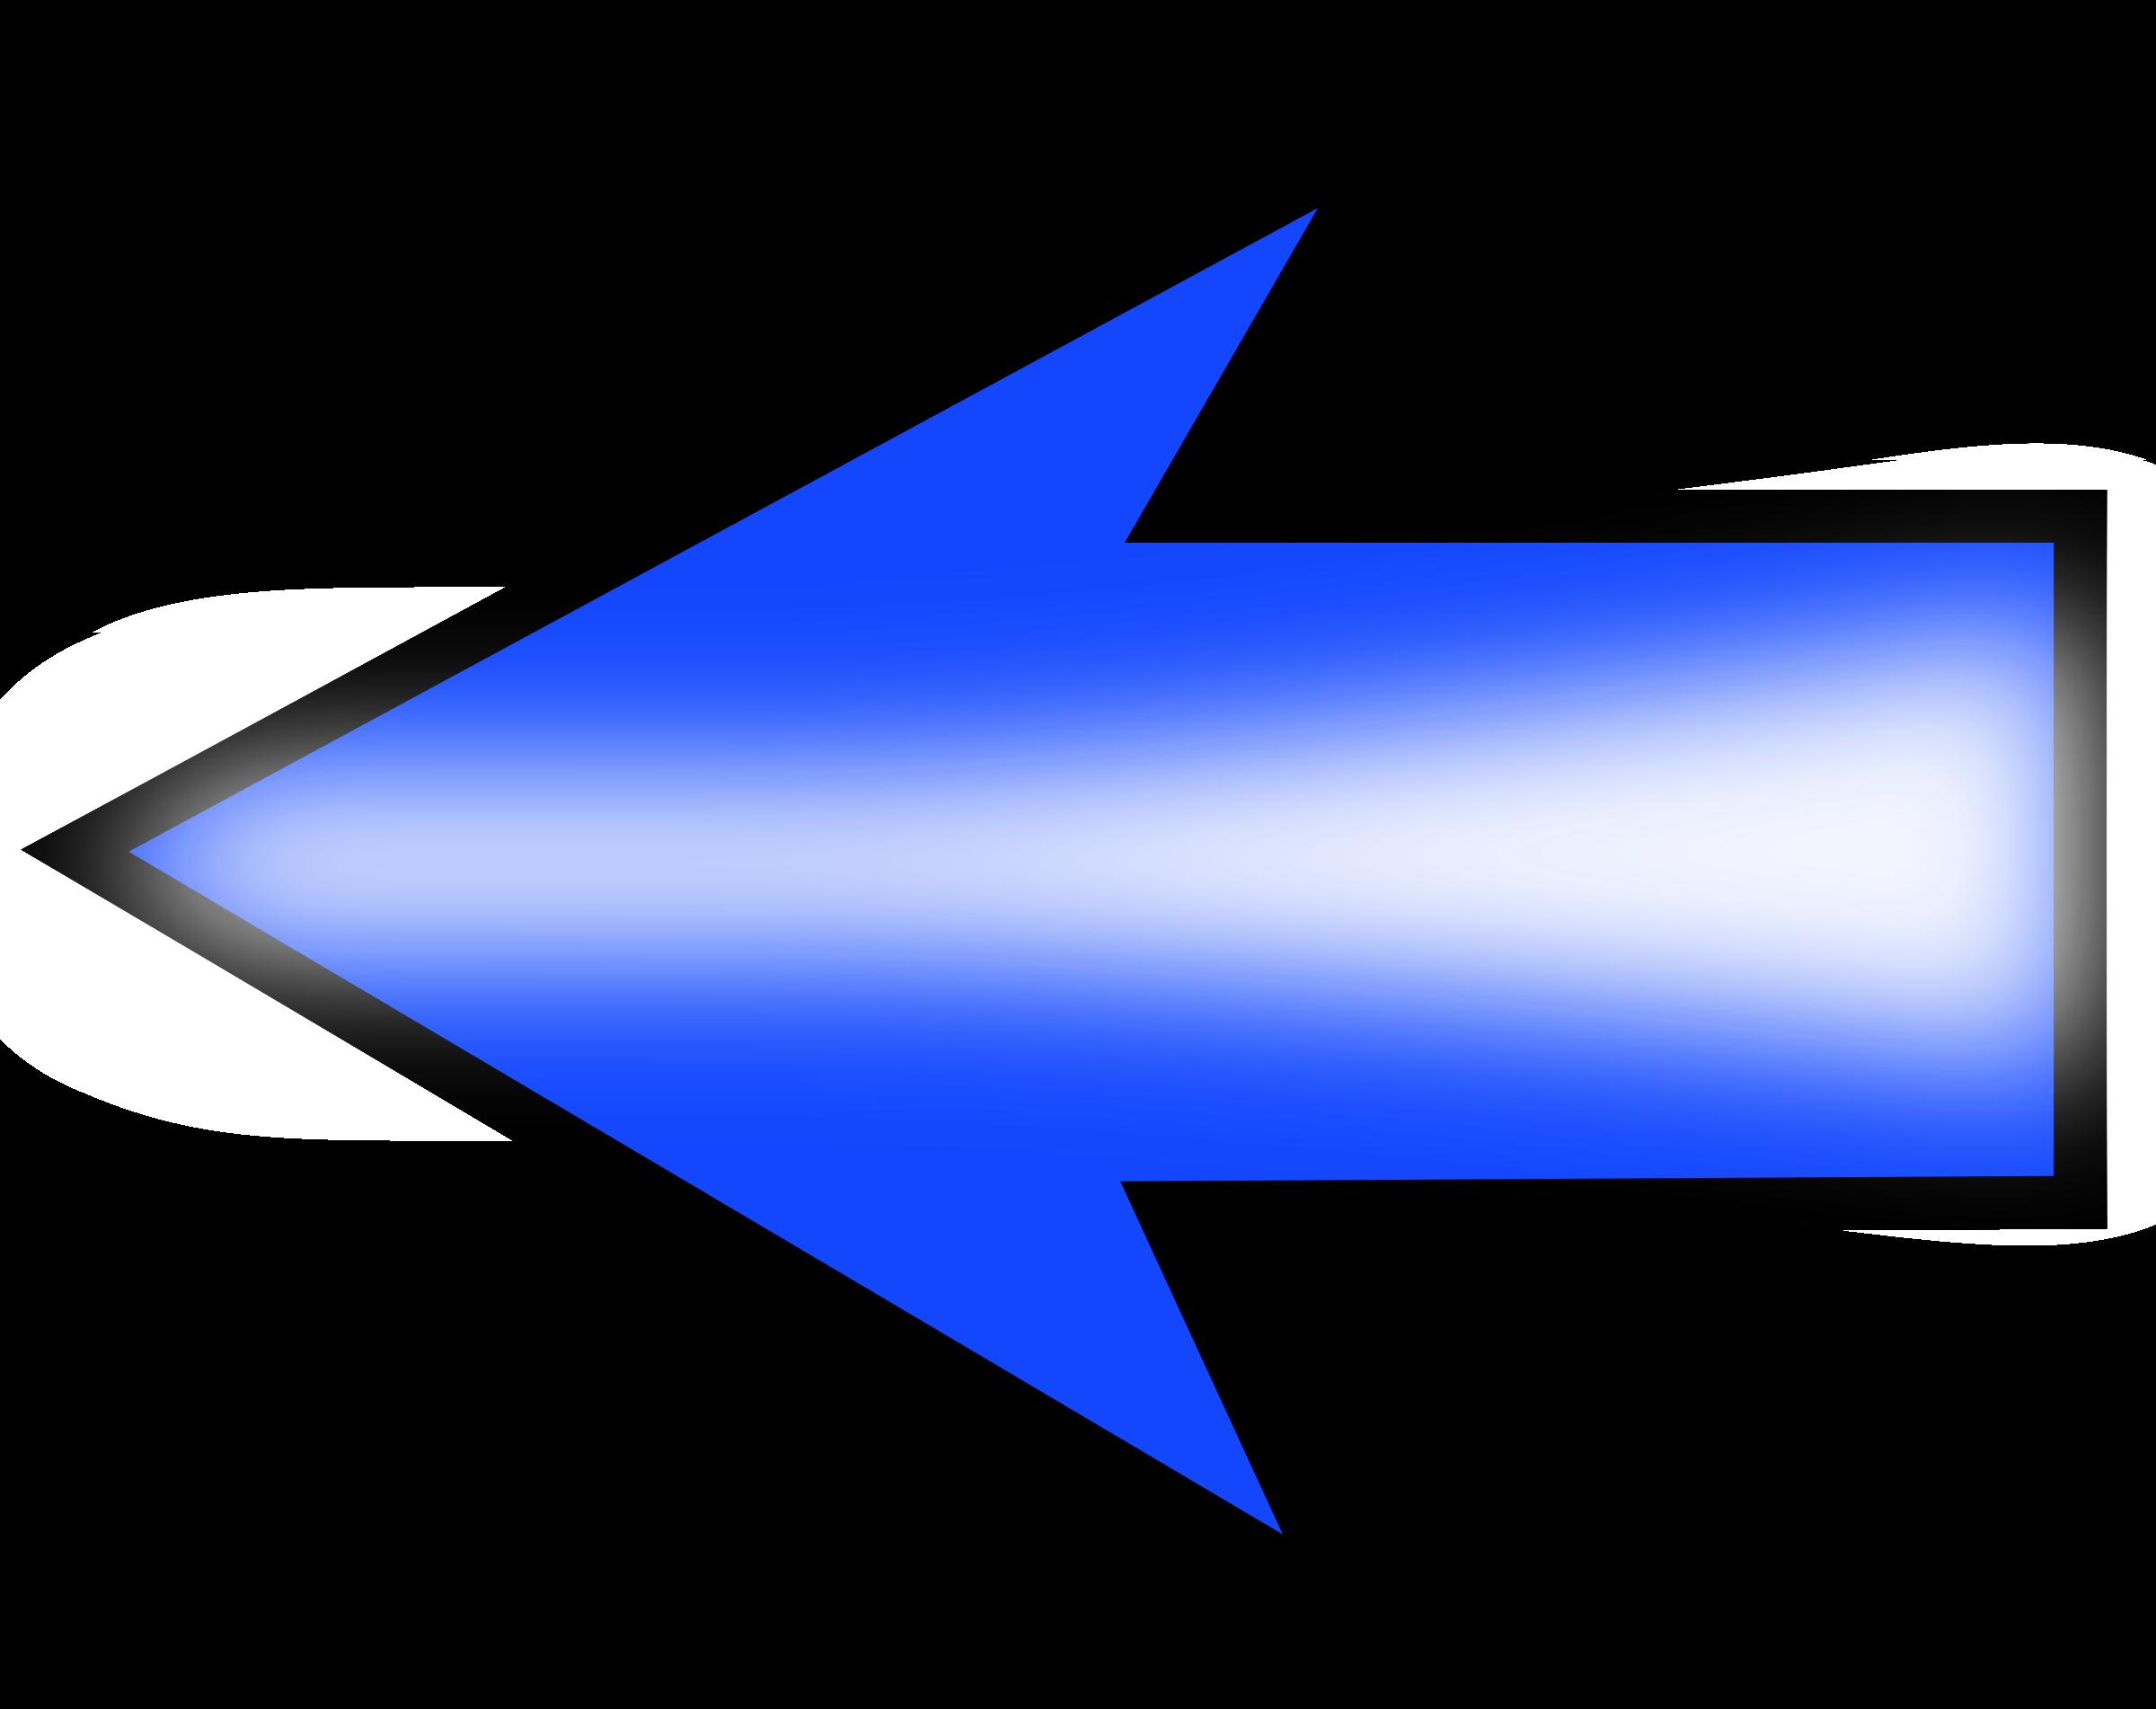 Tribal arrow clipart free png transparent stock ✓Arrow✓ Clip Art ❌ Black And White png transparent stock